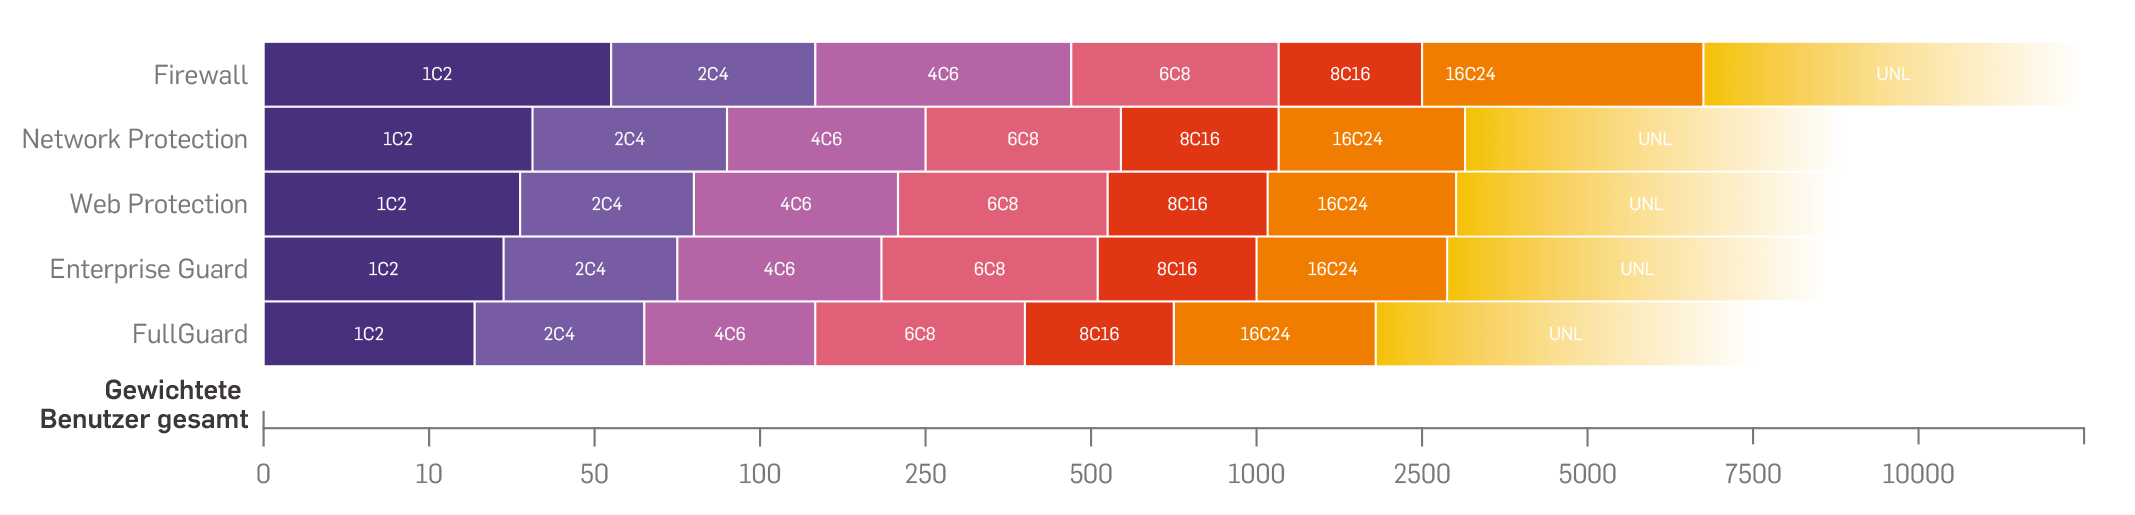 Sophos Sizing Guide XG Firewall – XG Series Appliances | UTMshop